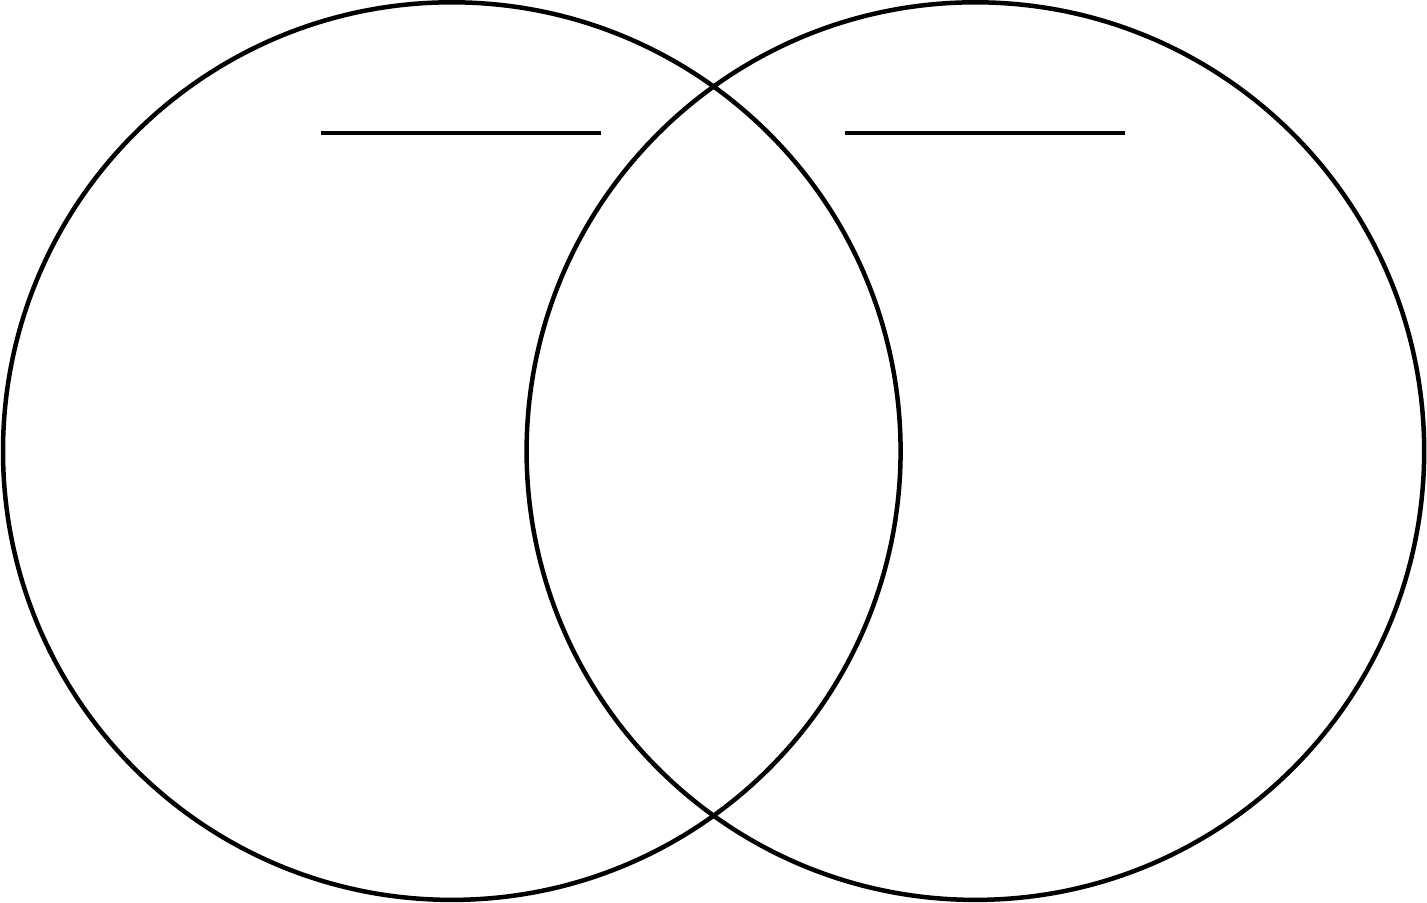 Venn Diagram Worksheet 3 Circle Venn Diagram Worksheet Luxury Venn Diagram Examples